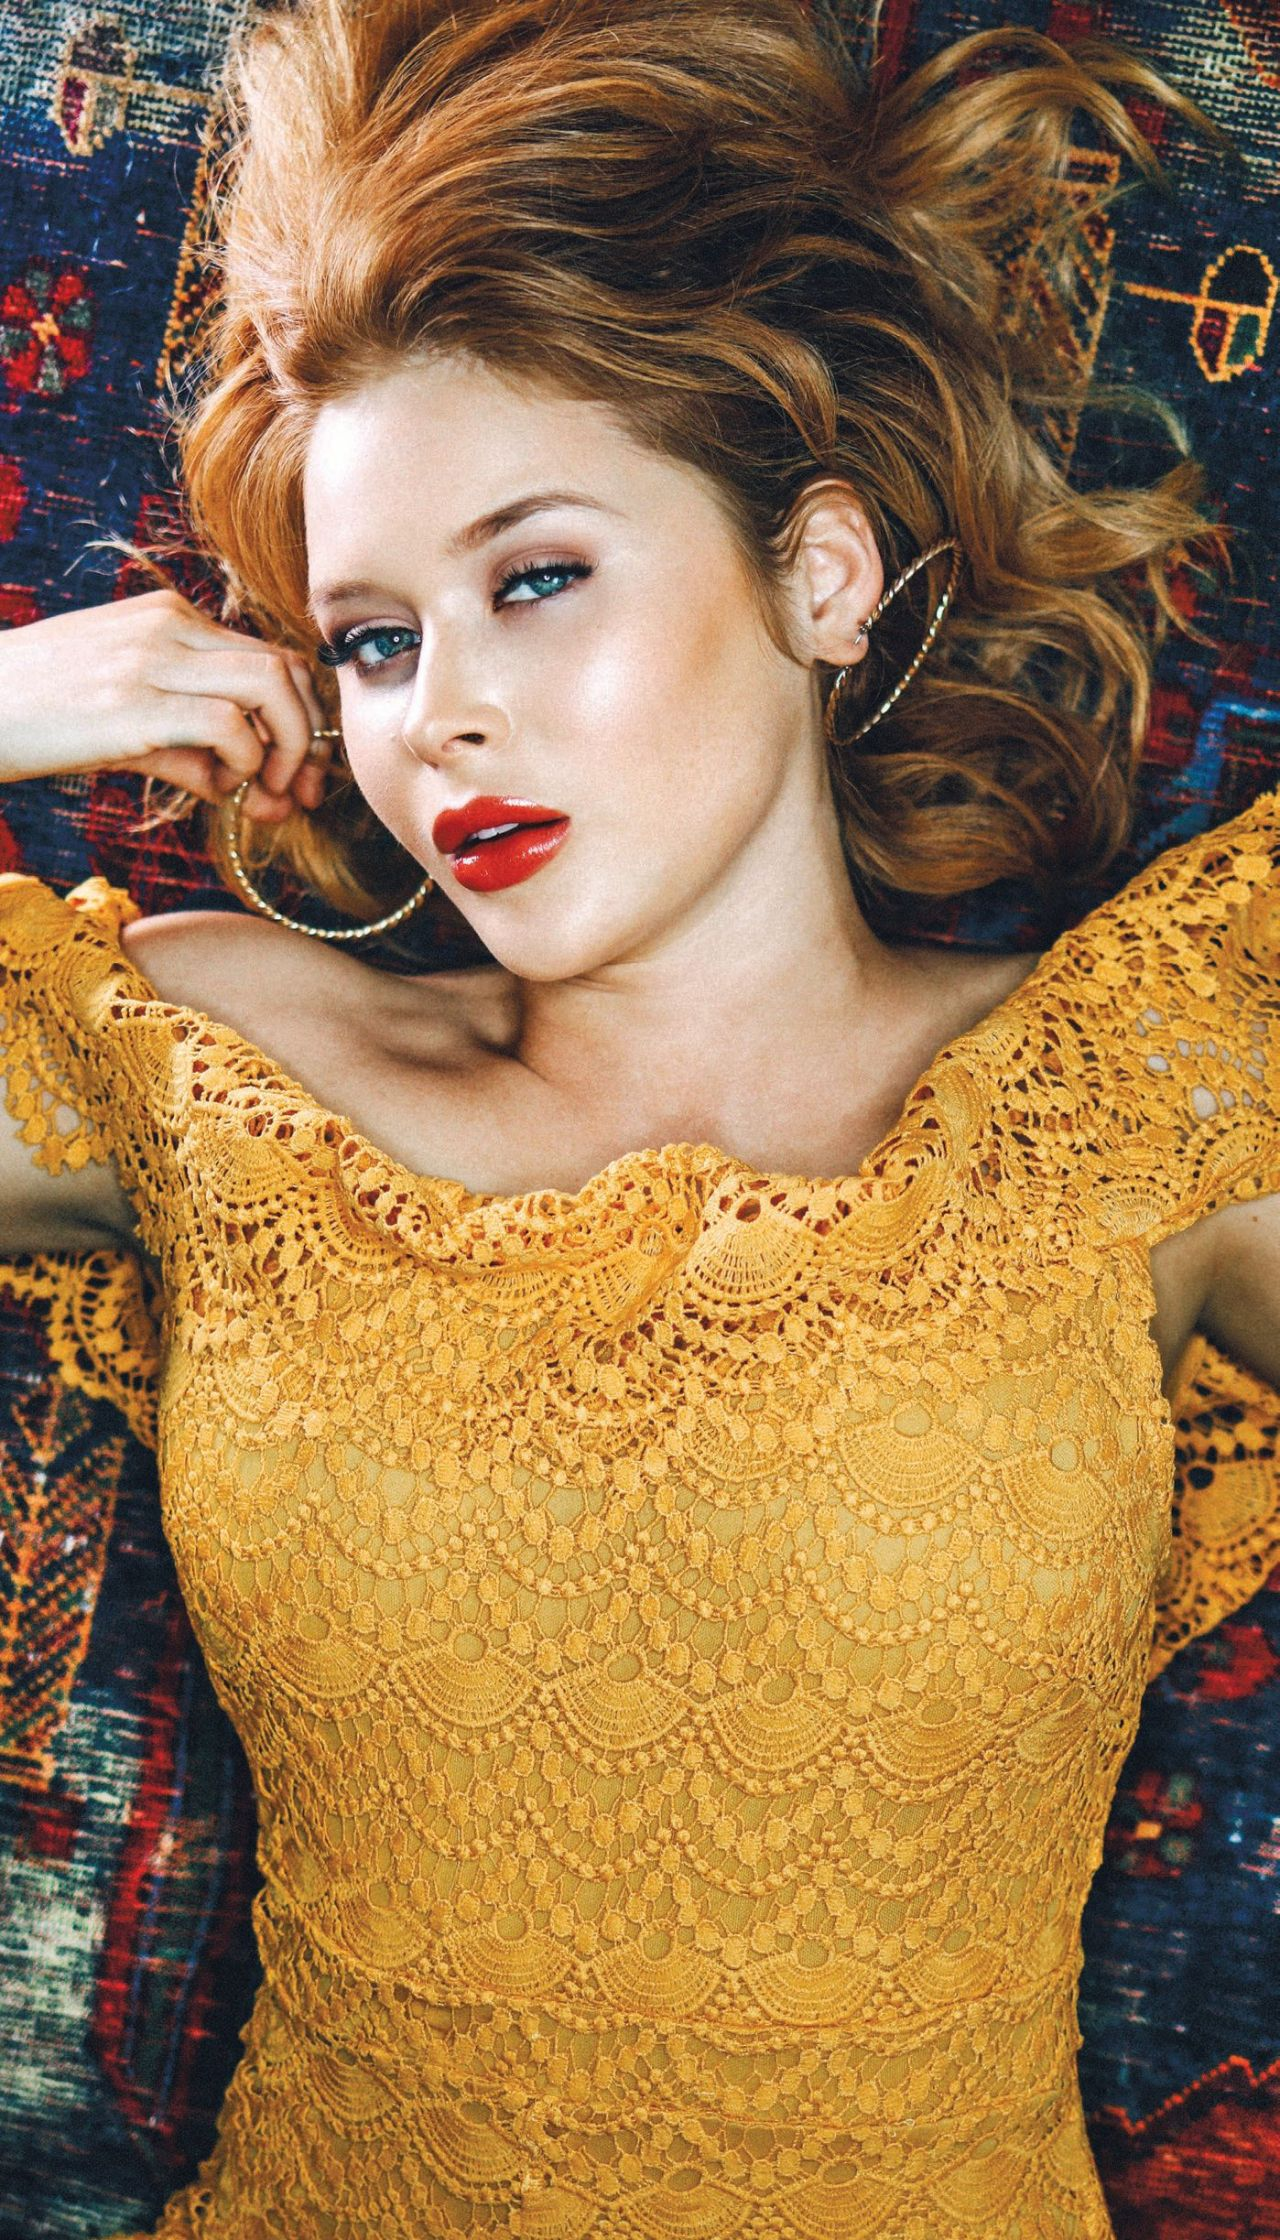 Renee Olstead - Photoshoot for Modern Luxury Houston, October 2017